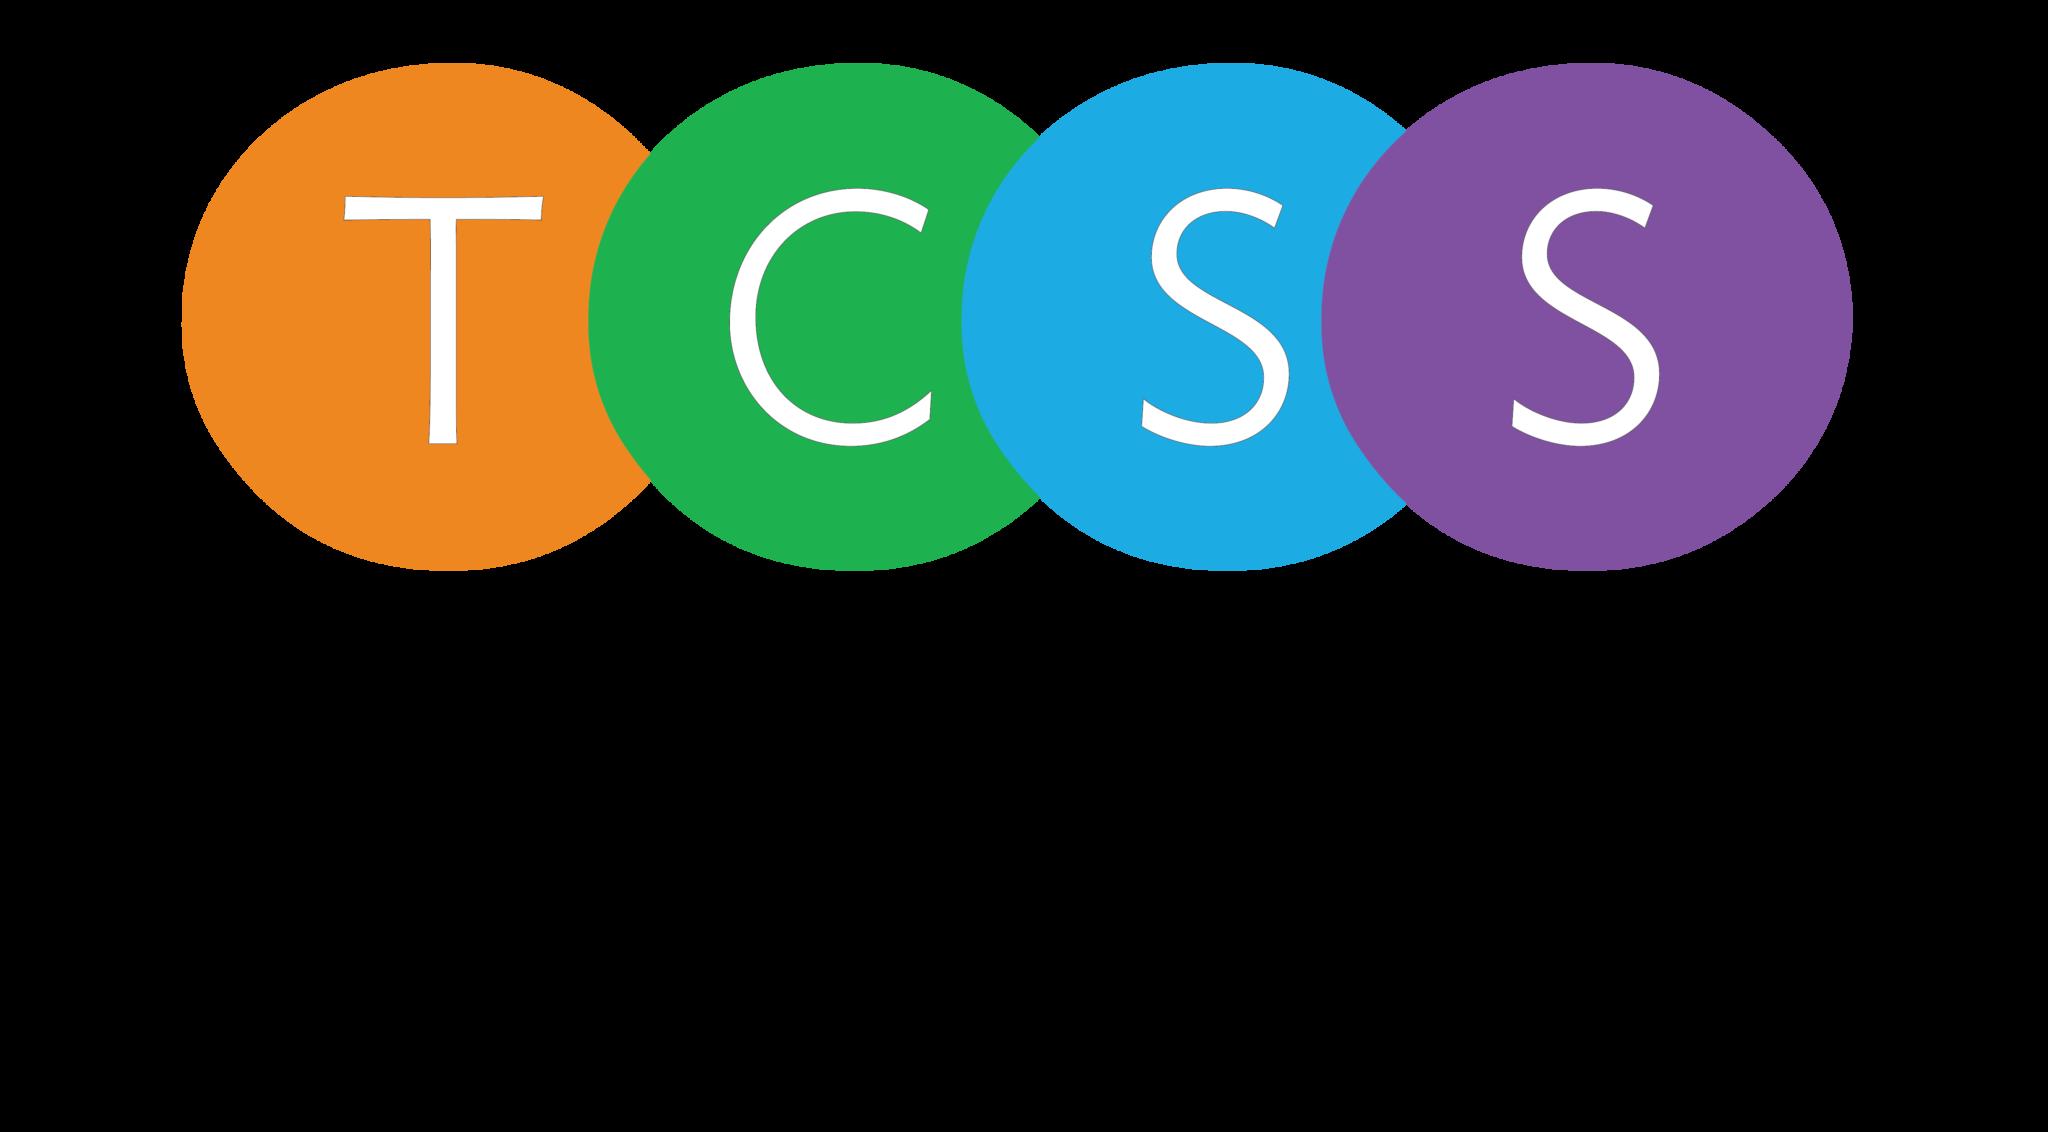 tcss-logo-2048×1132